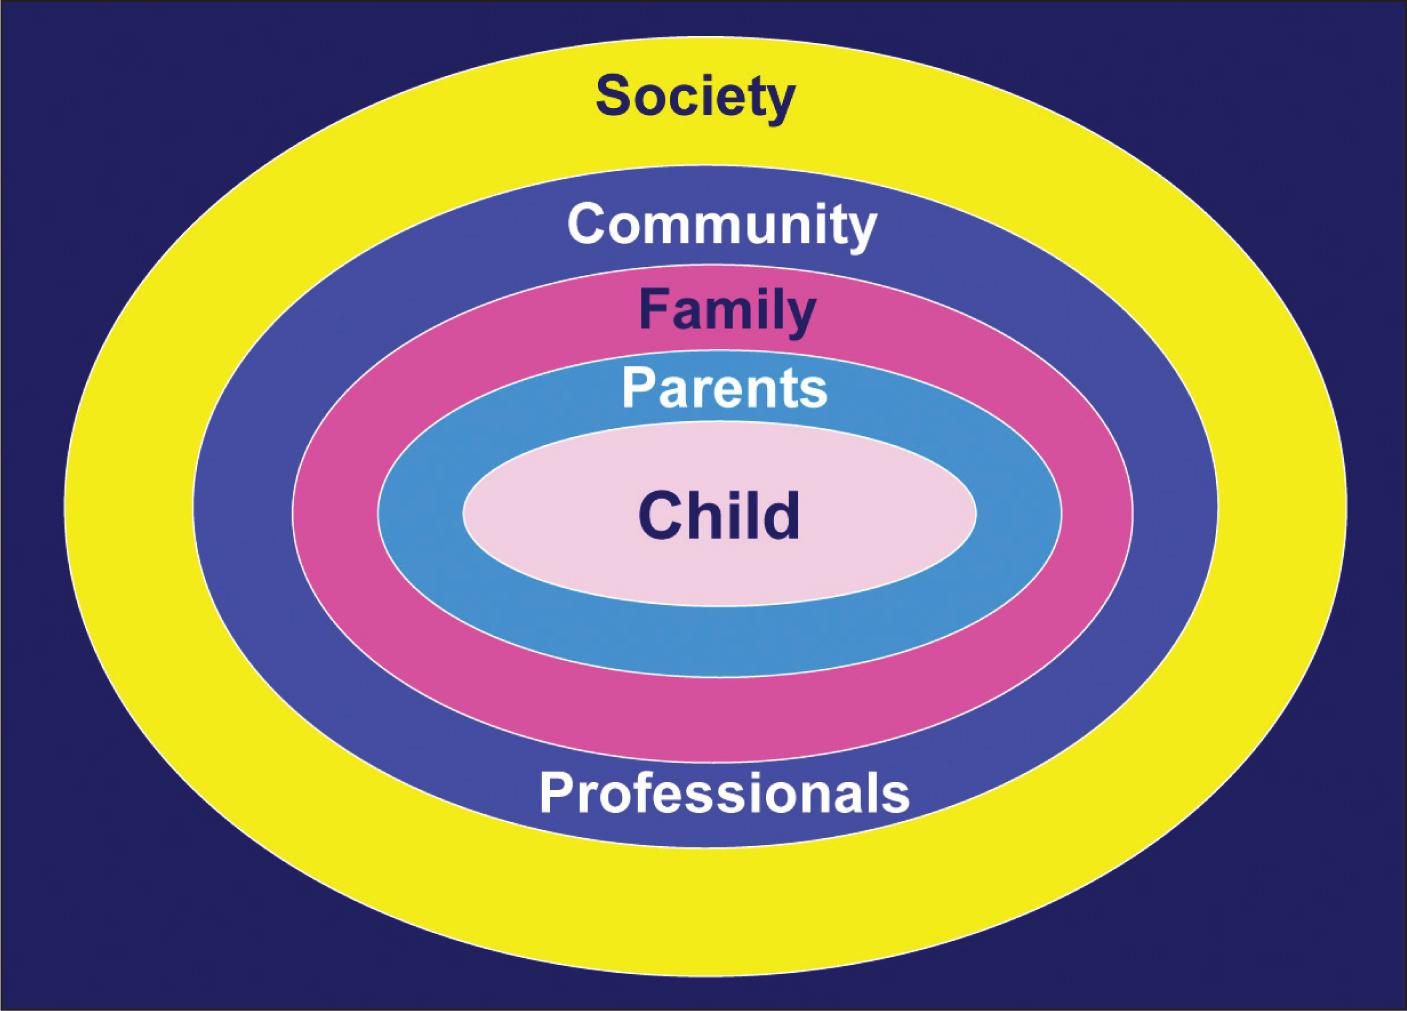 Contributors to child neglect.